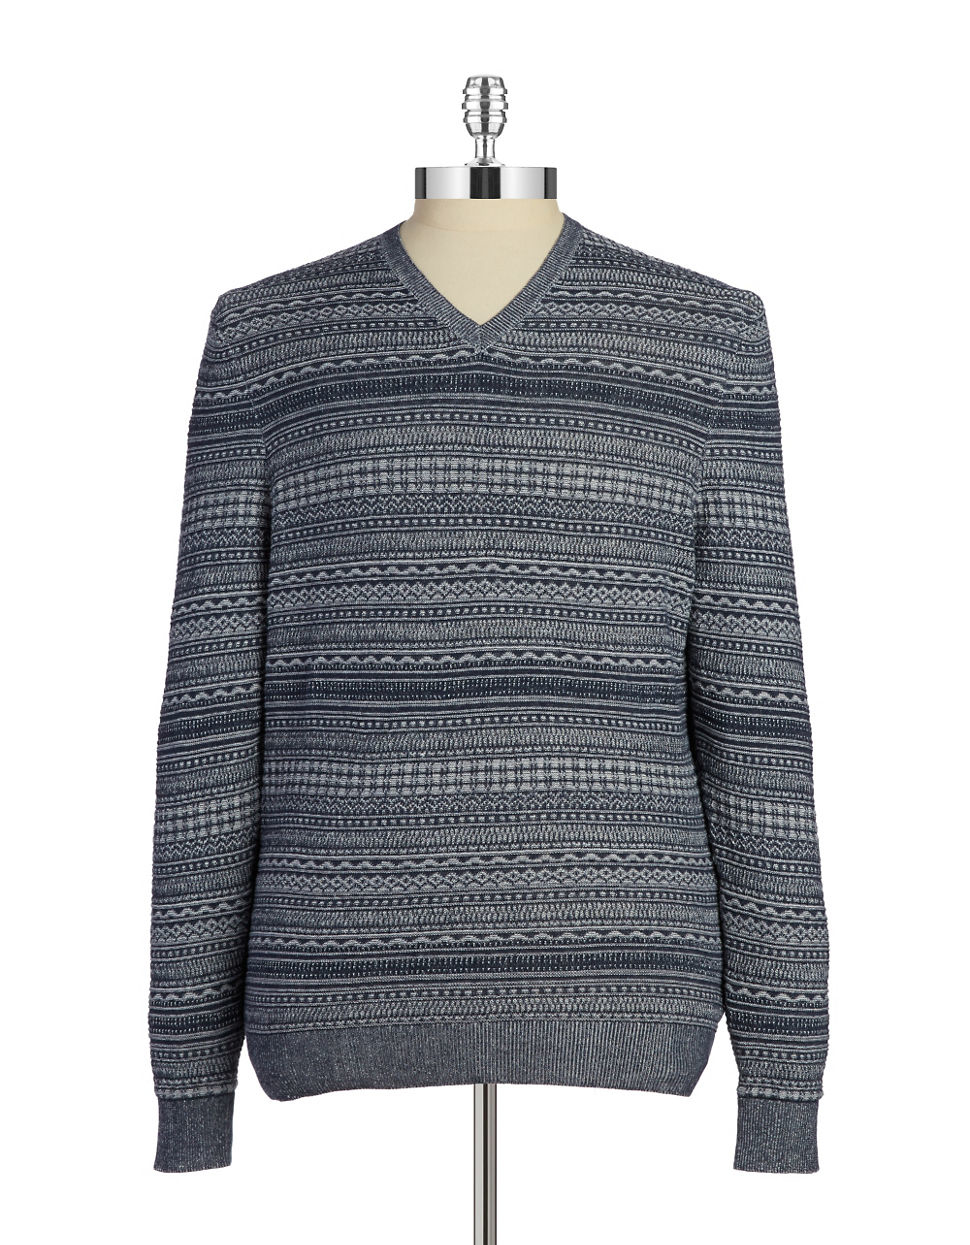 lyst hudson north fair isle knit pullover in black for men. Black Bedroom Furniture Sets. Home Design Ideas